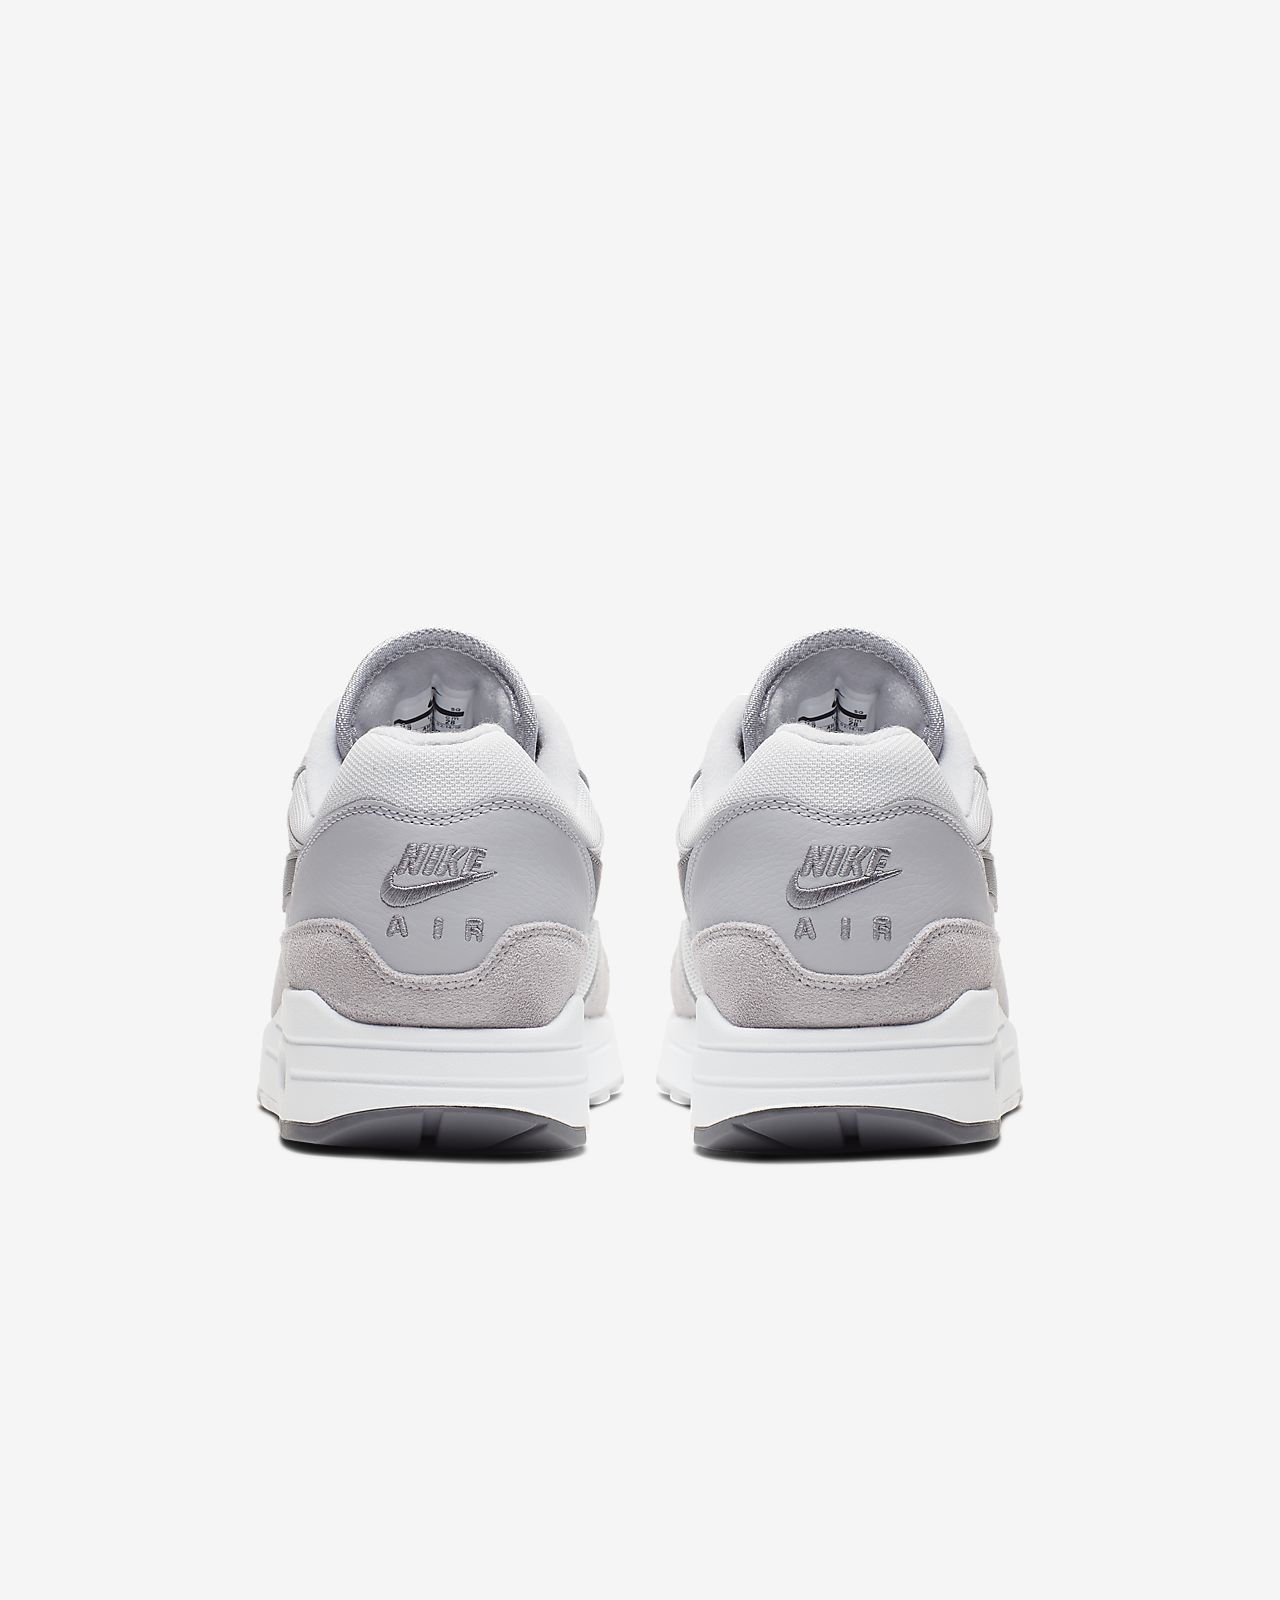 Nike Air Max One men's 10 WhiteBlackGrey colour way Barely